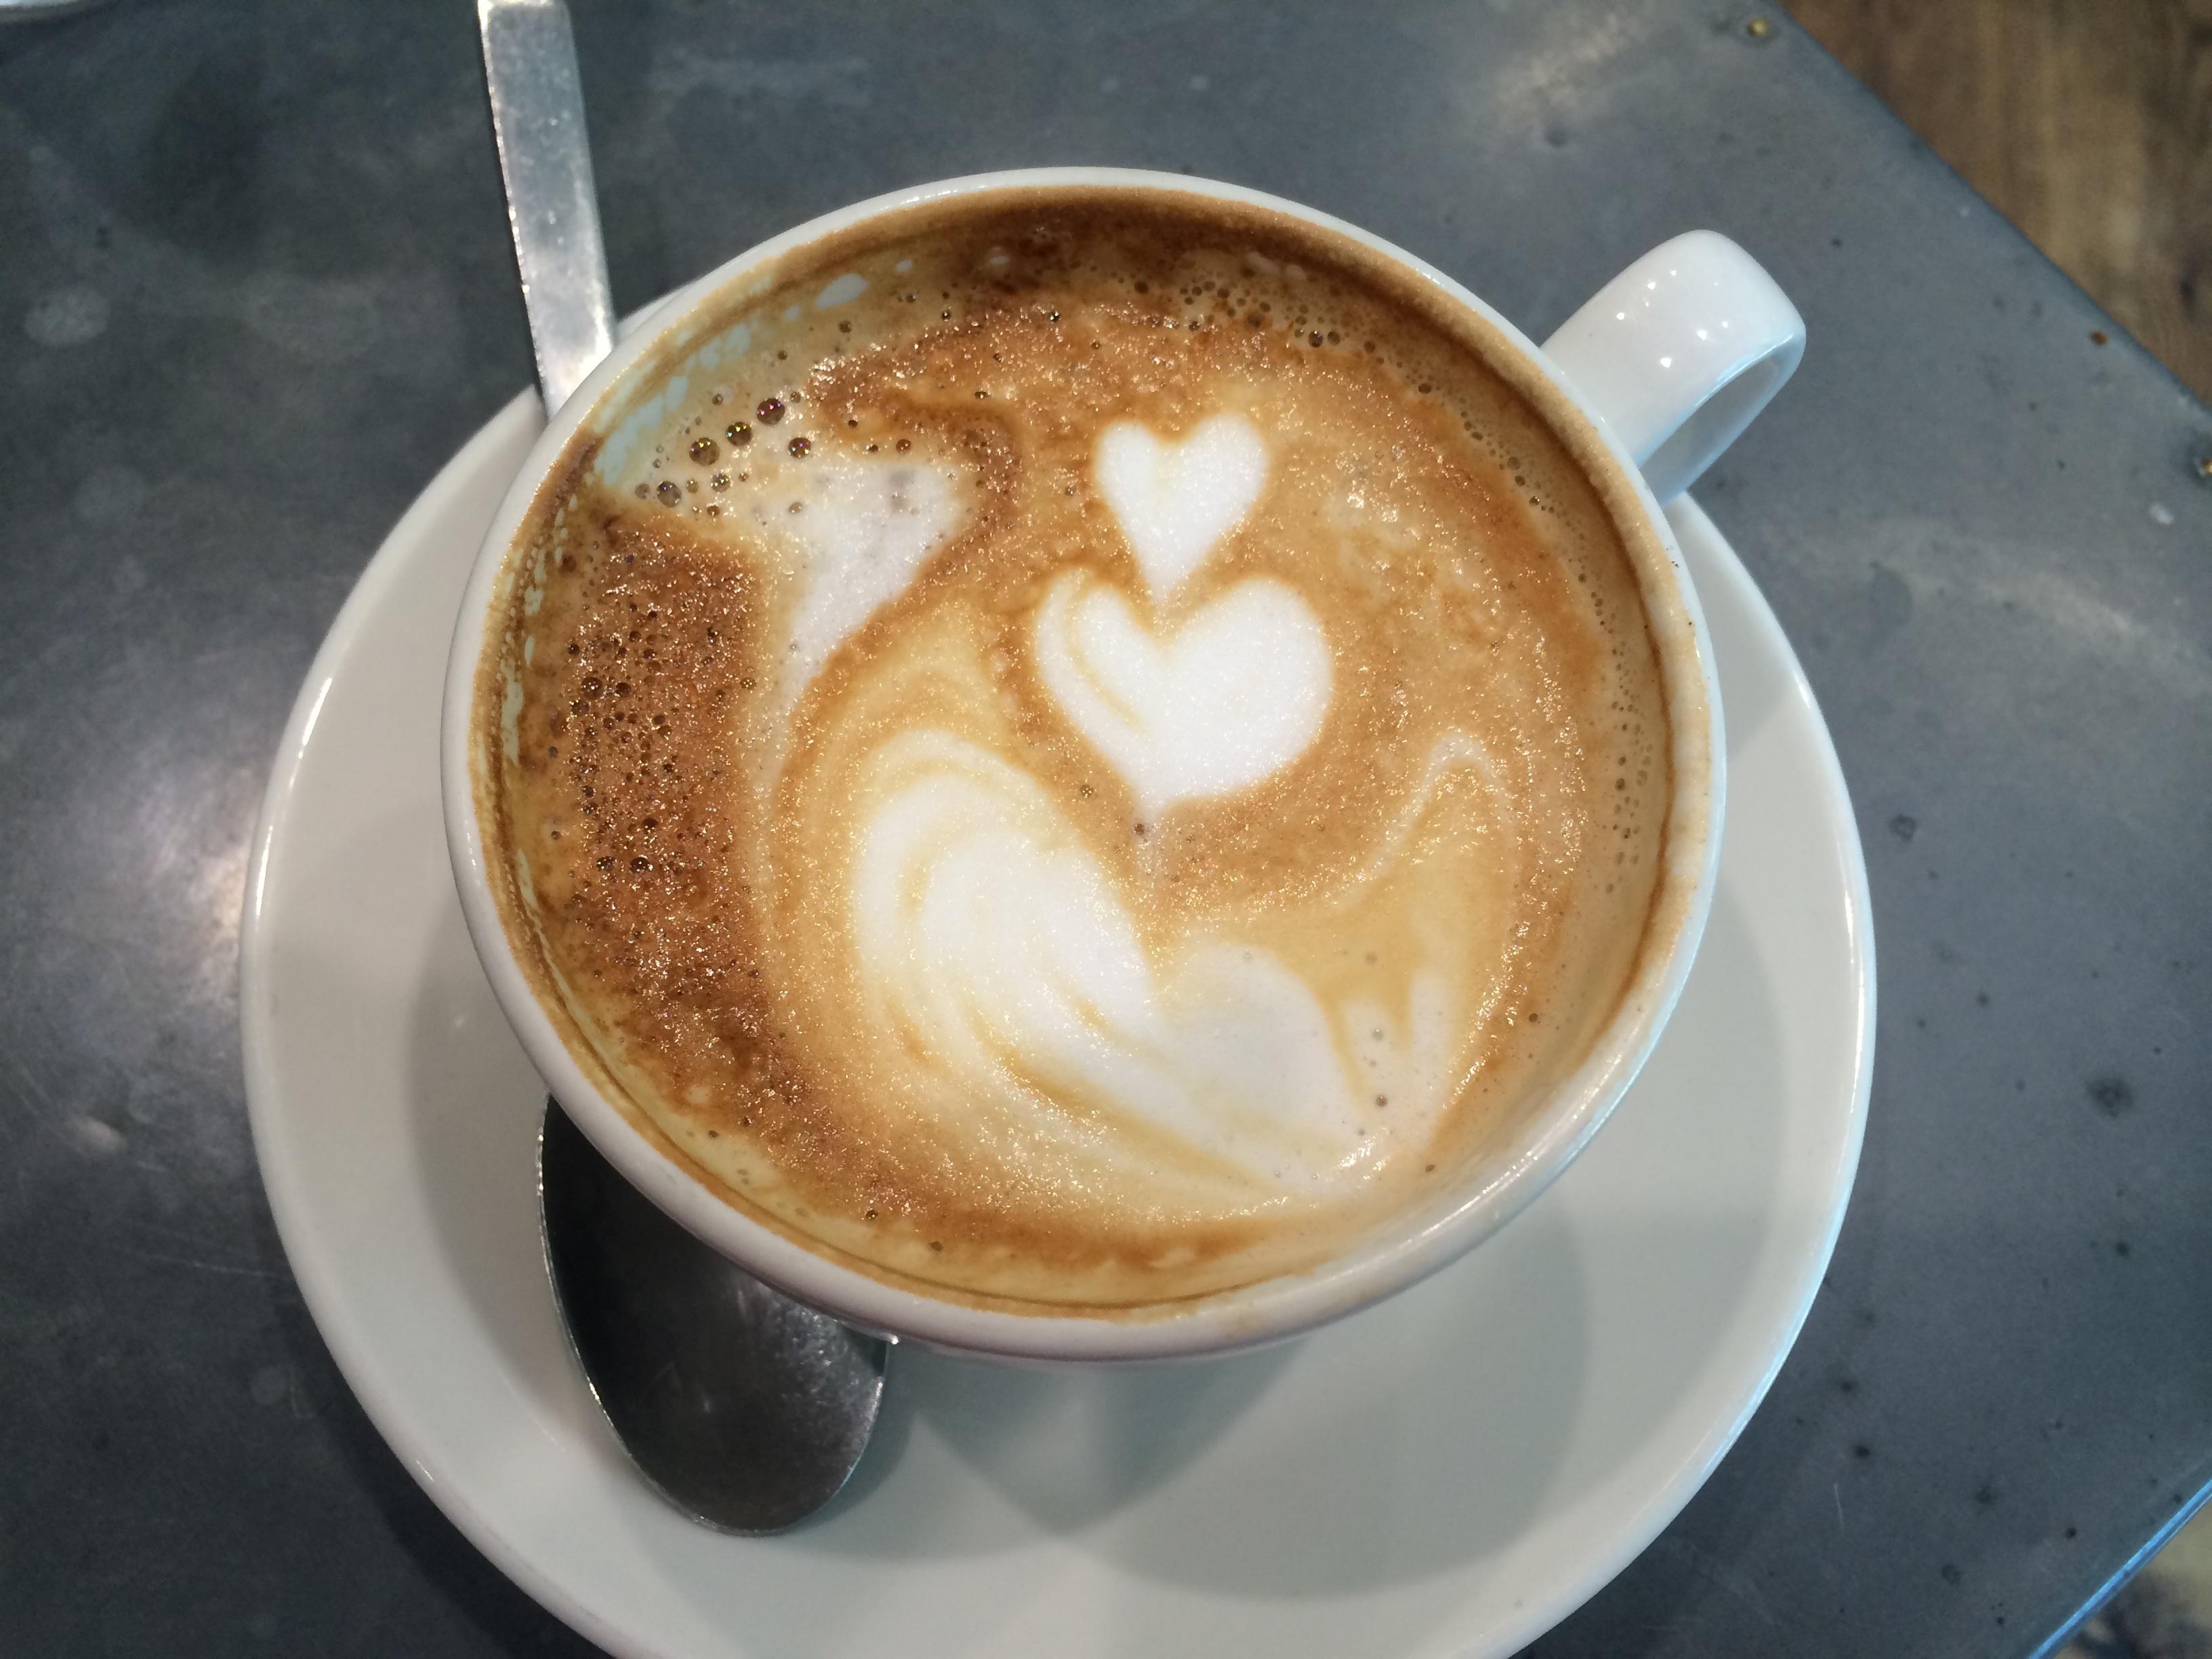 Kostenlose foto : Latté, Cappuccino, Getränk, Espresso, Koffein ...